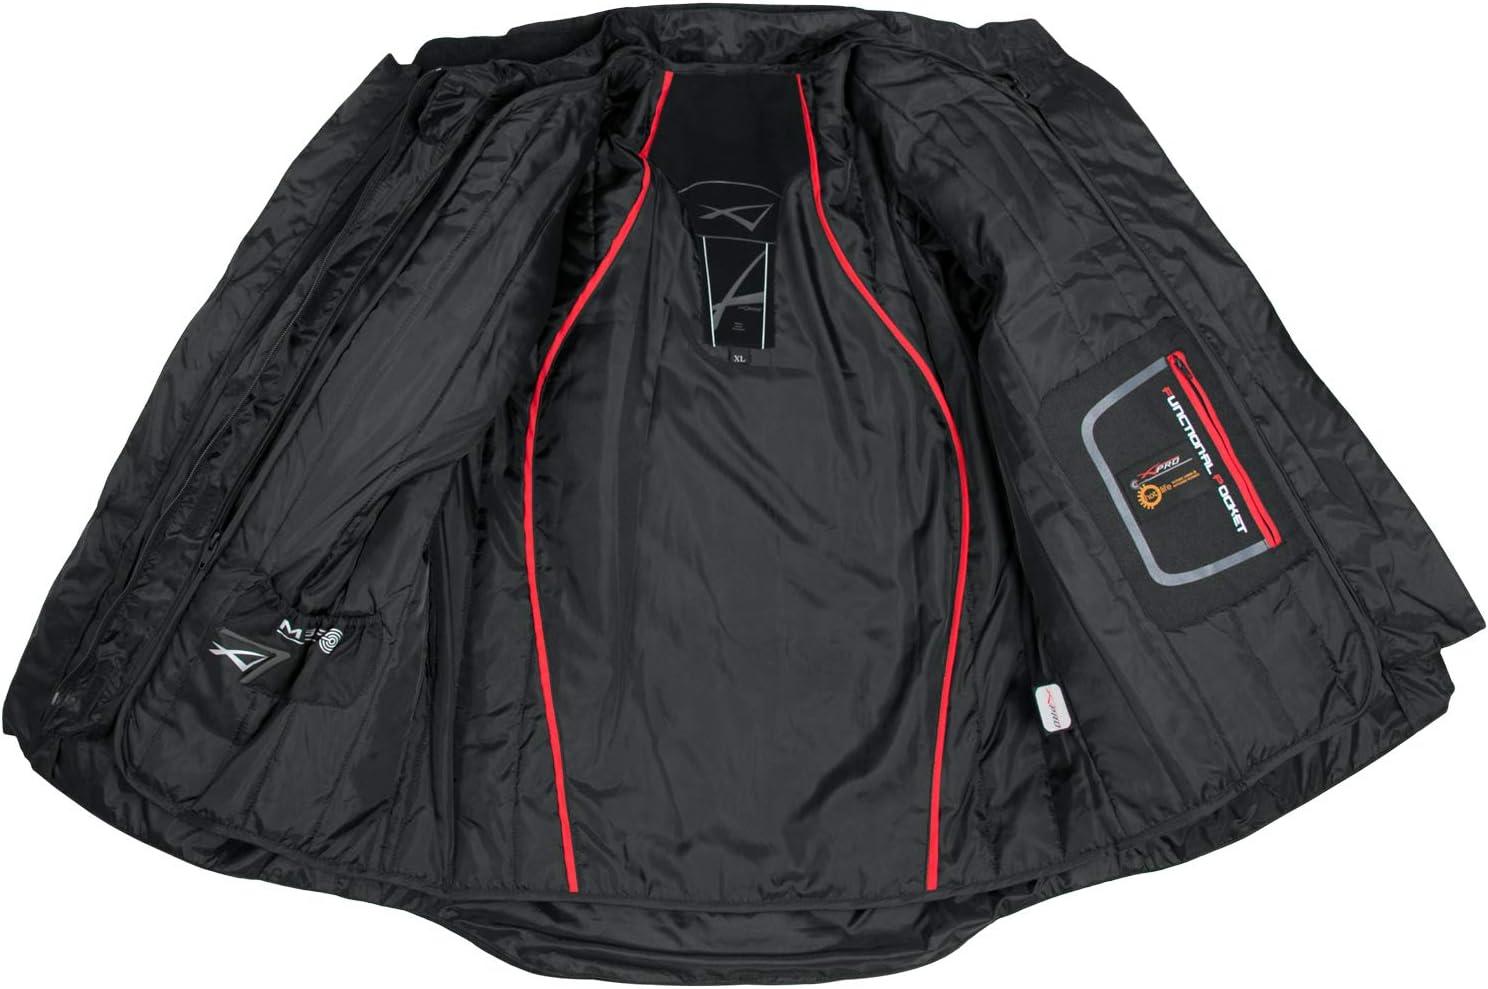 Giacca Offroad Enduro Moto Turismo Impermeabile Tessuto Protezioni Nero L